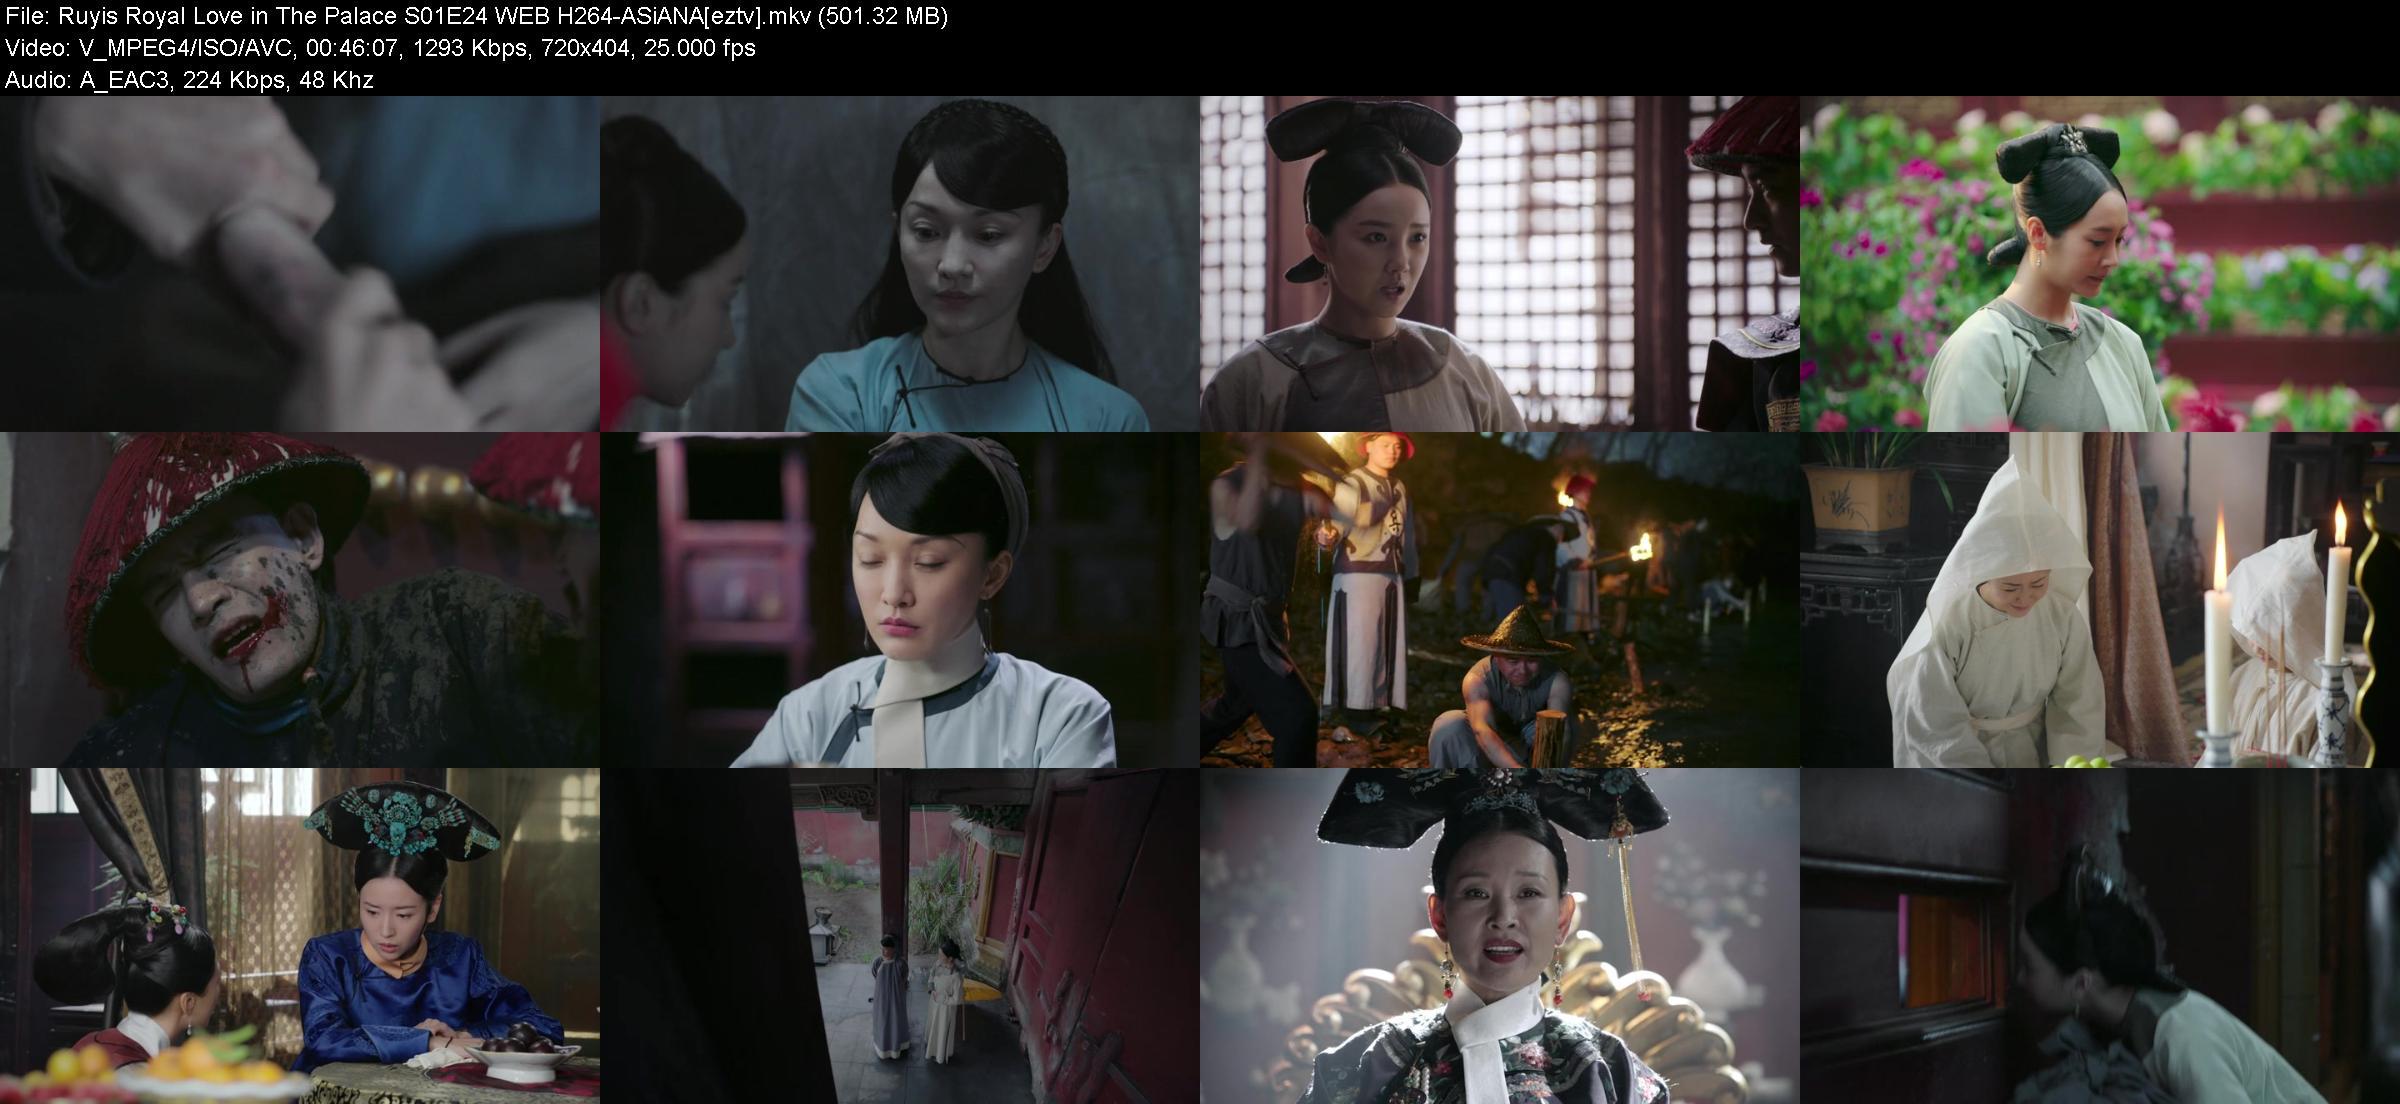 Ruyis Royal Love in The Palace S01E24 WEB H264-ASiANA